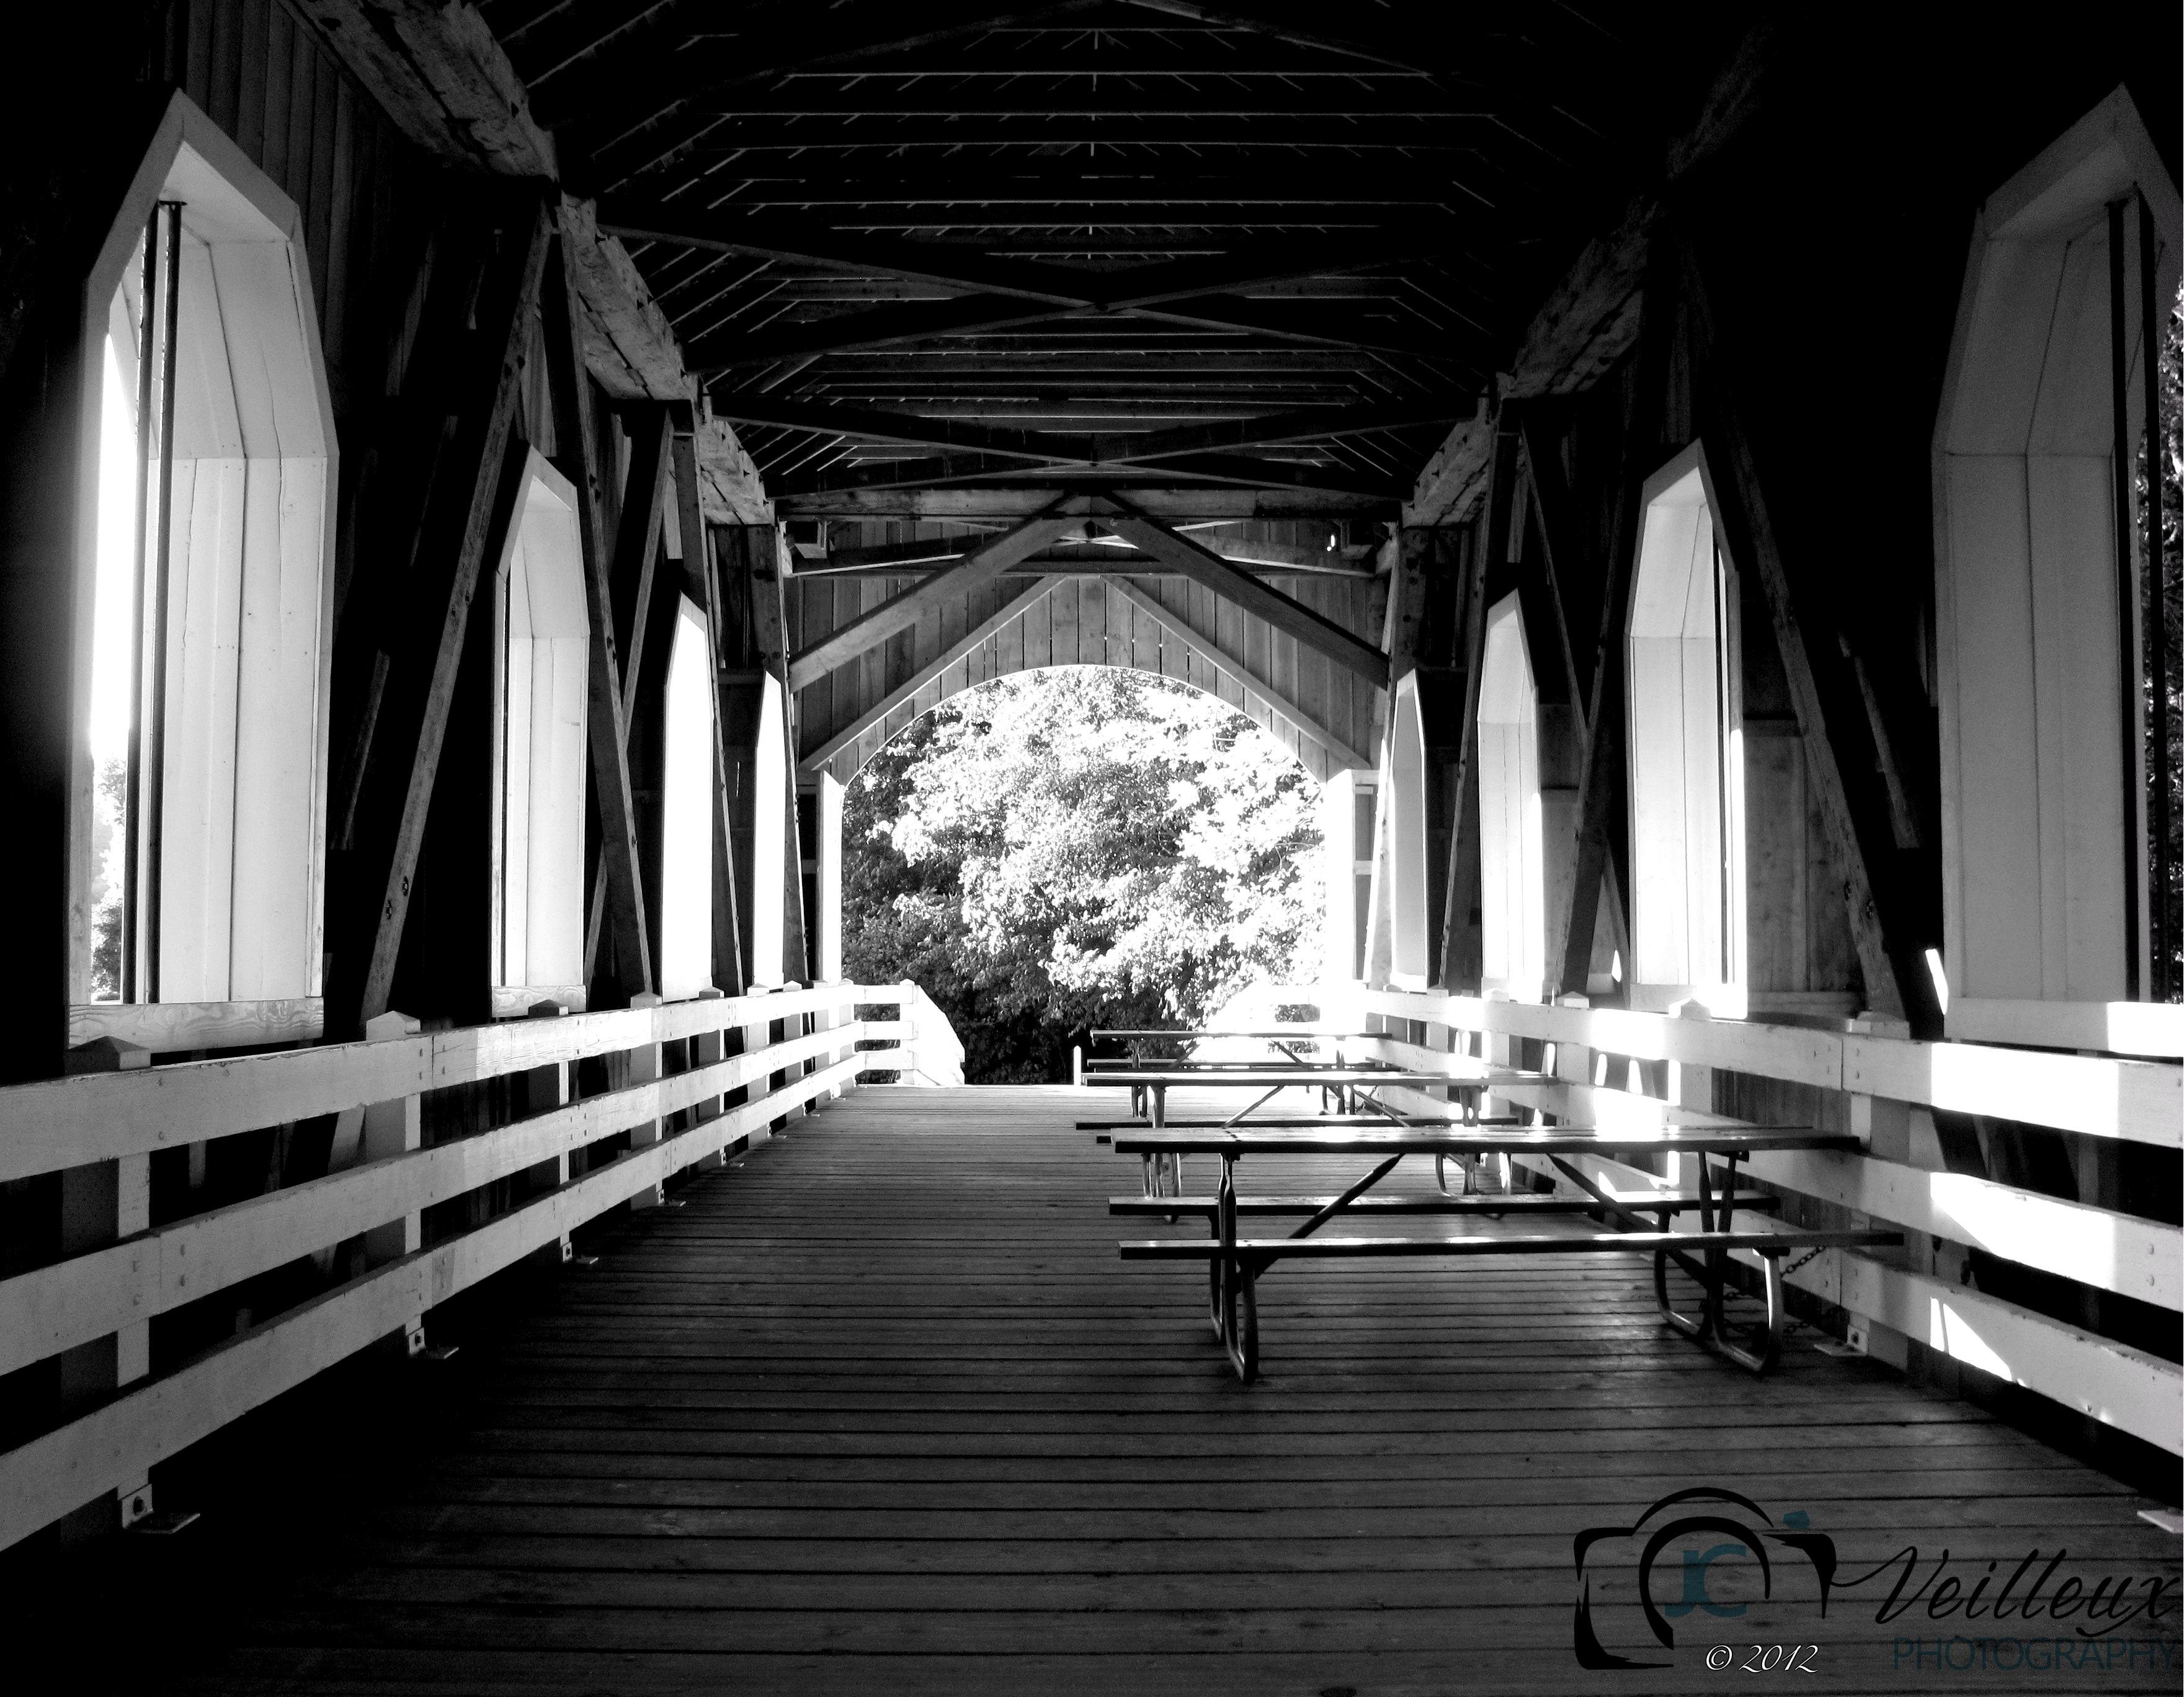 Covered Bridge No. 1